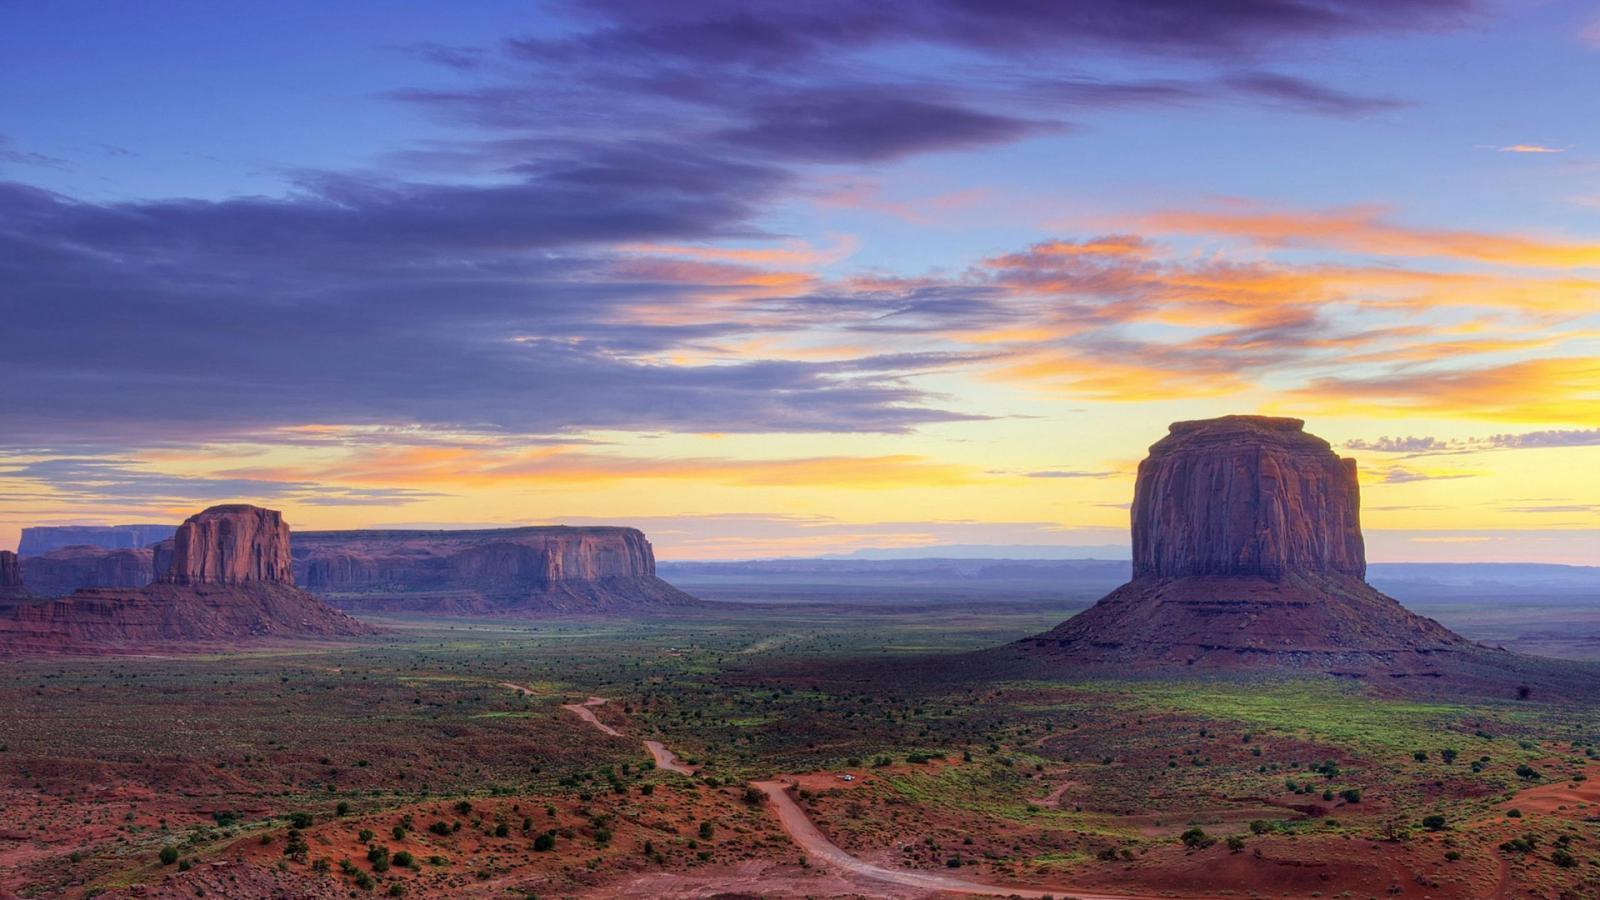 Monument Valley of Colorado Plateau Wallpaper HD Desktop Wallpapers 1600x900